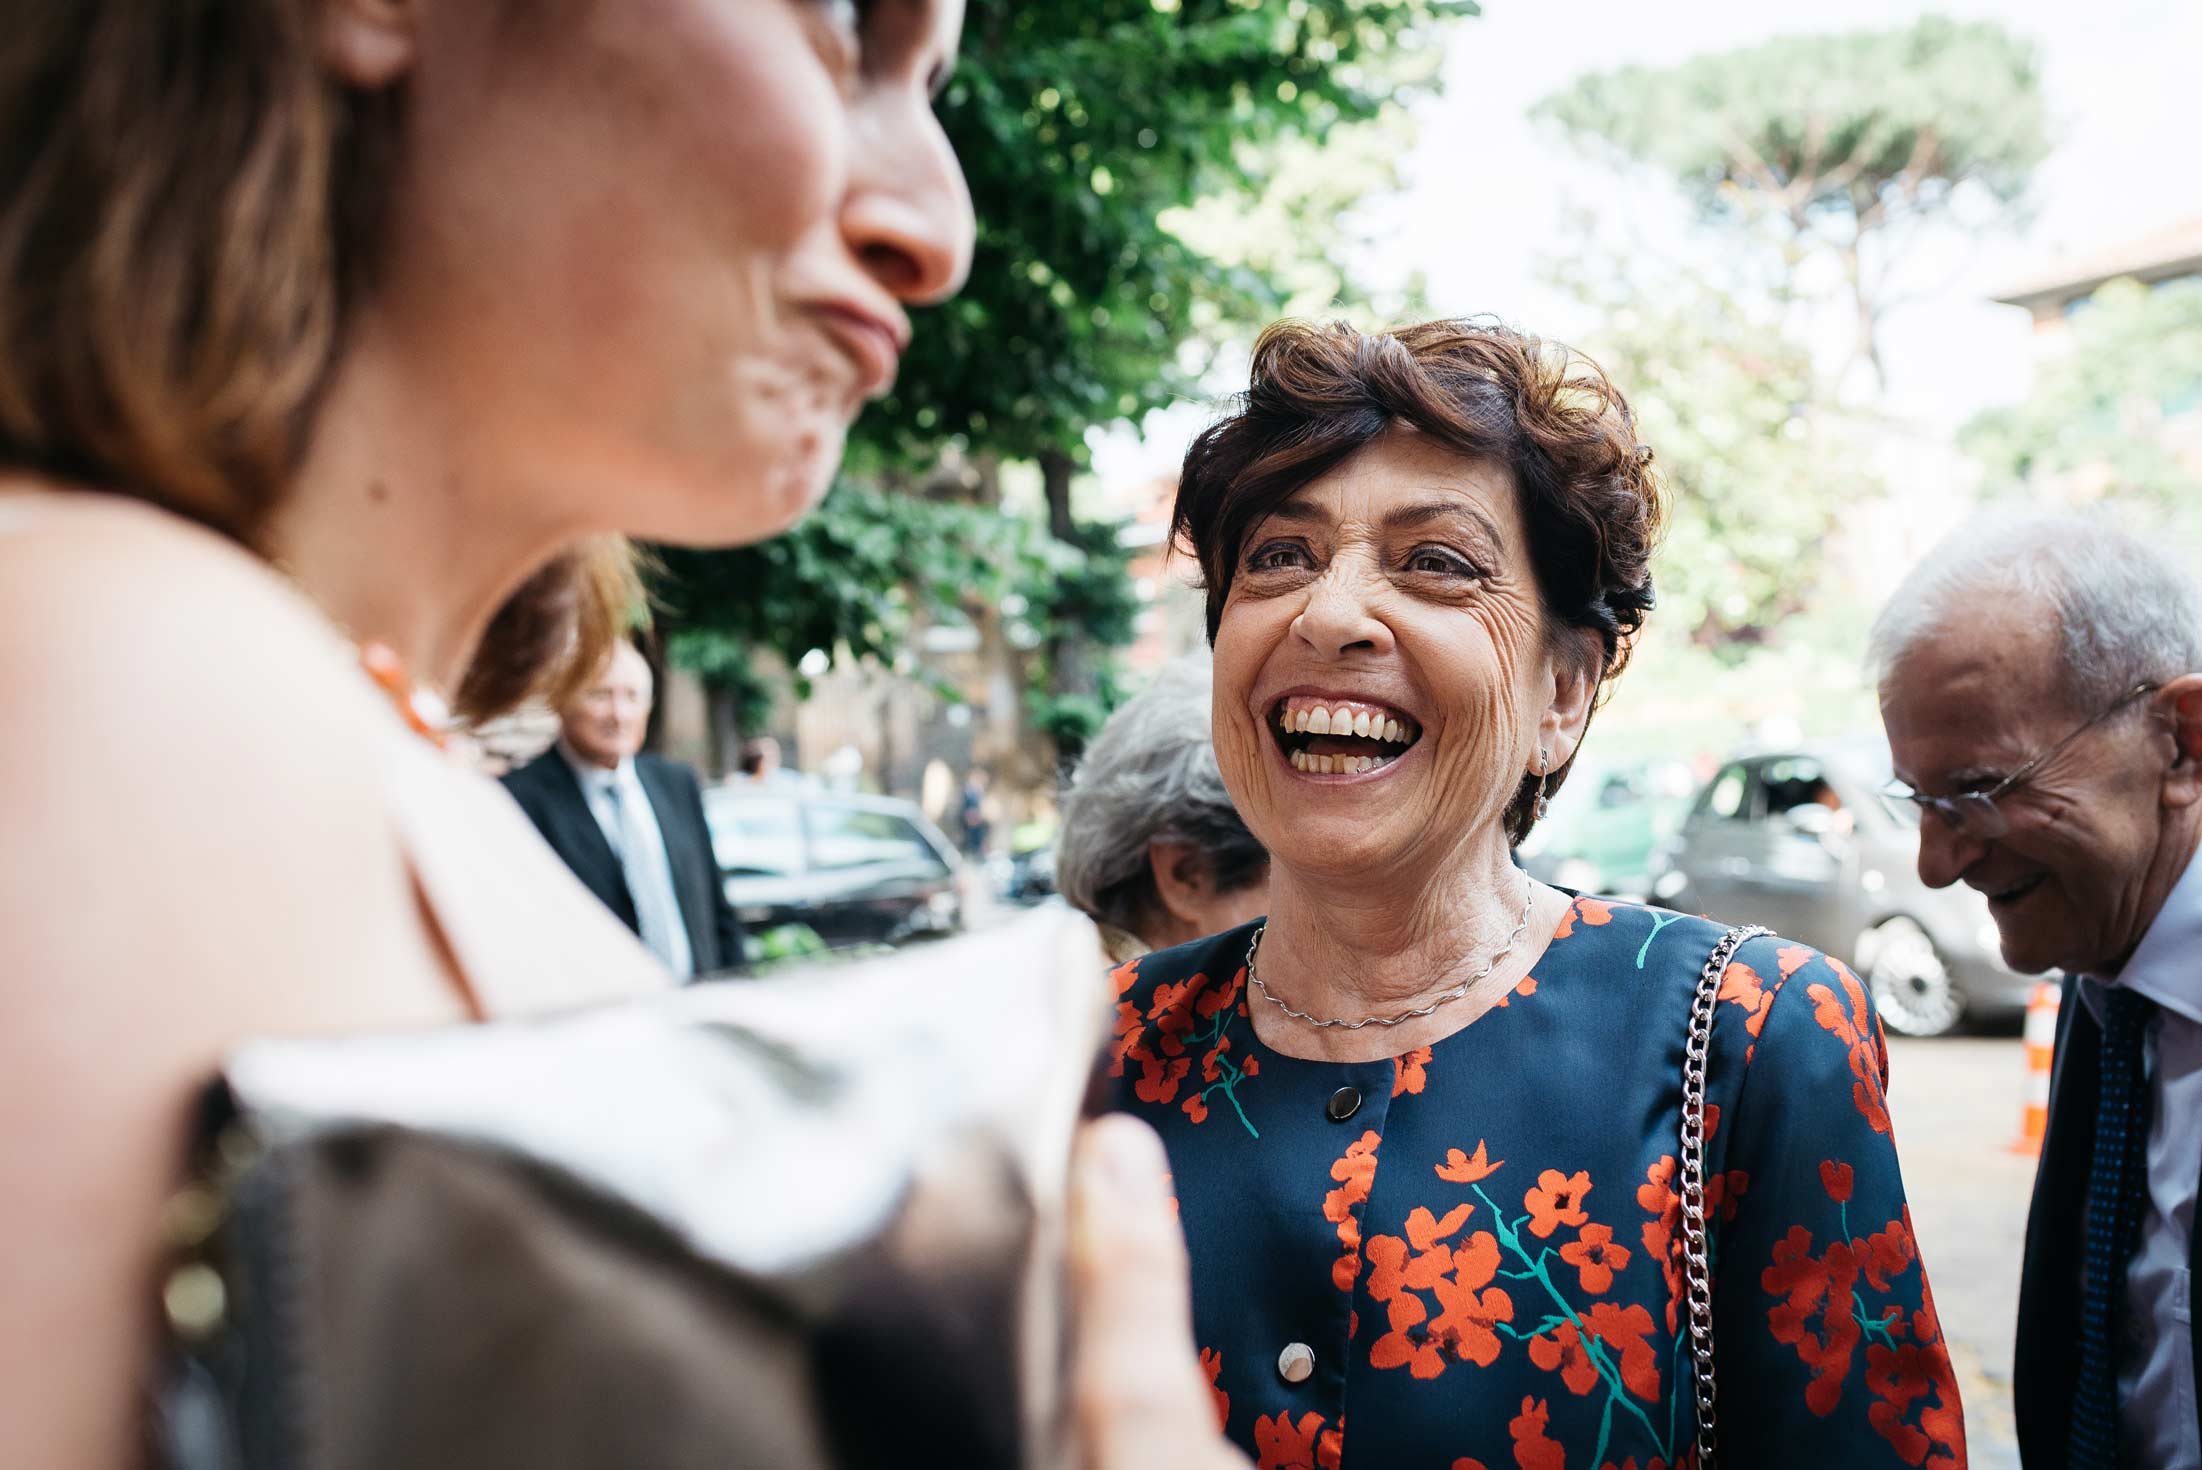 Reportage-Wedding-Photography-Rome-Ceremony